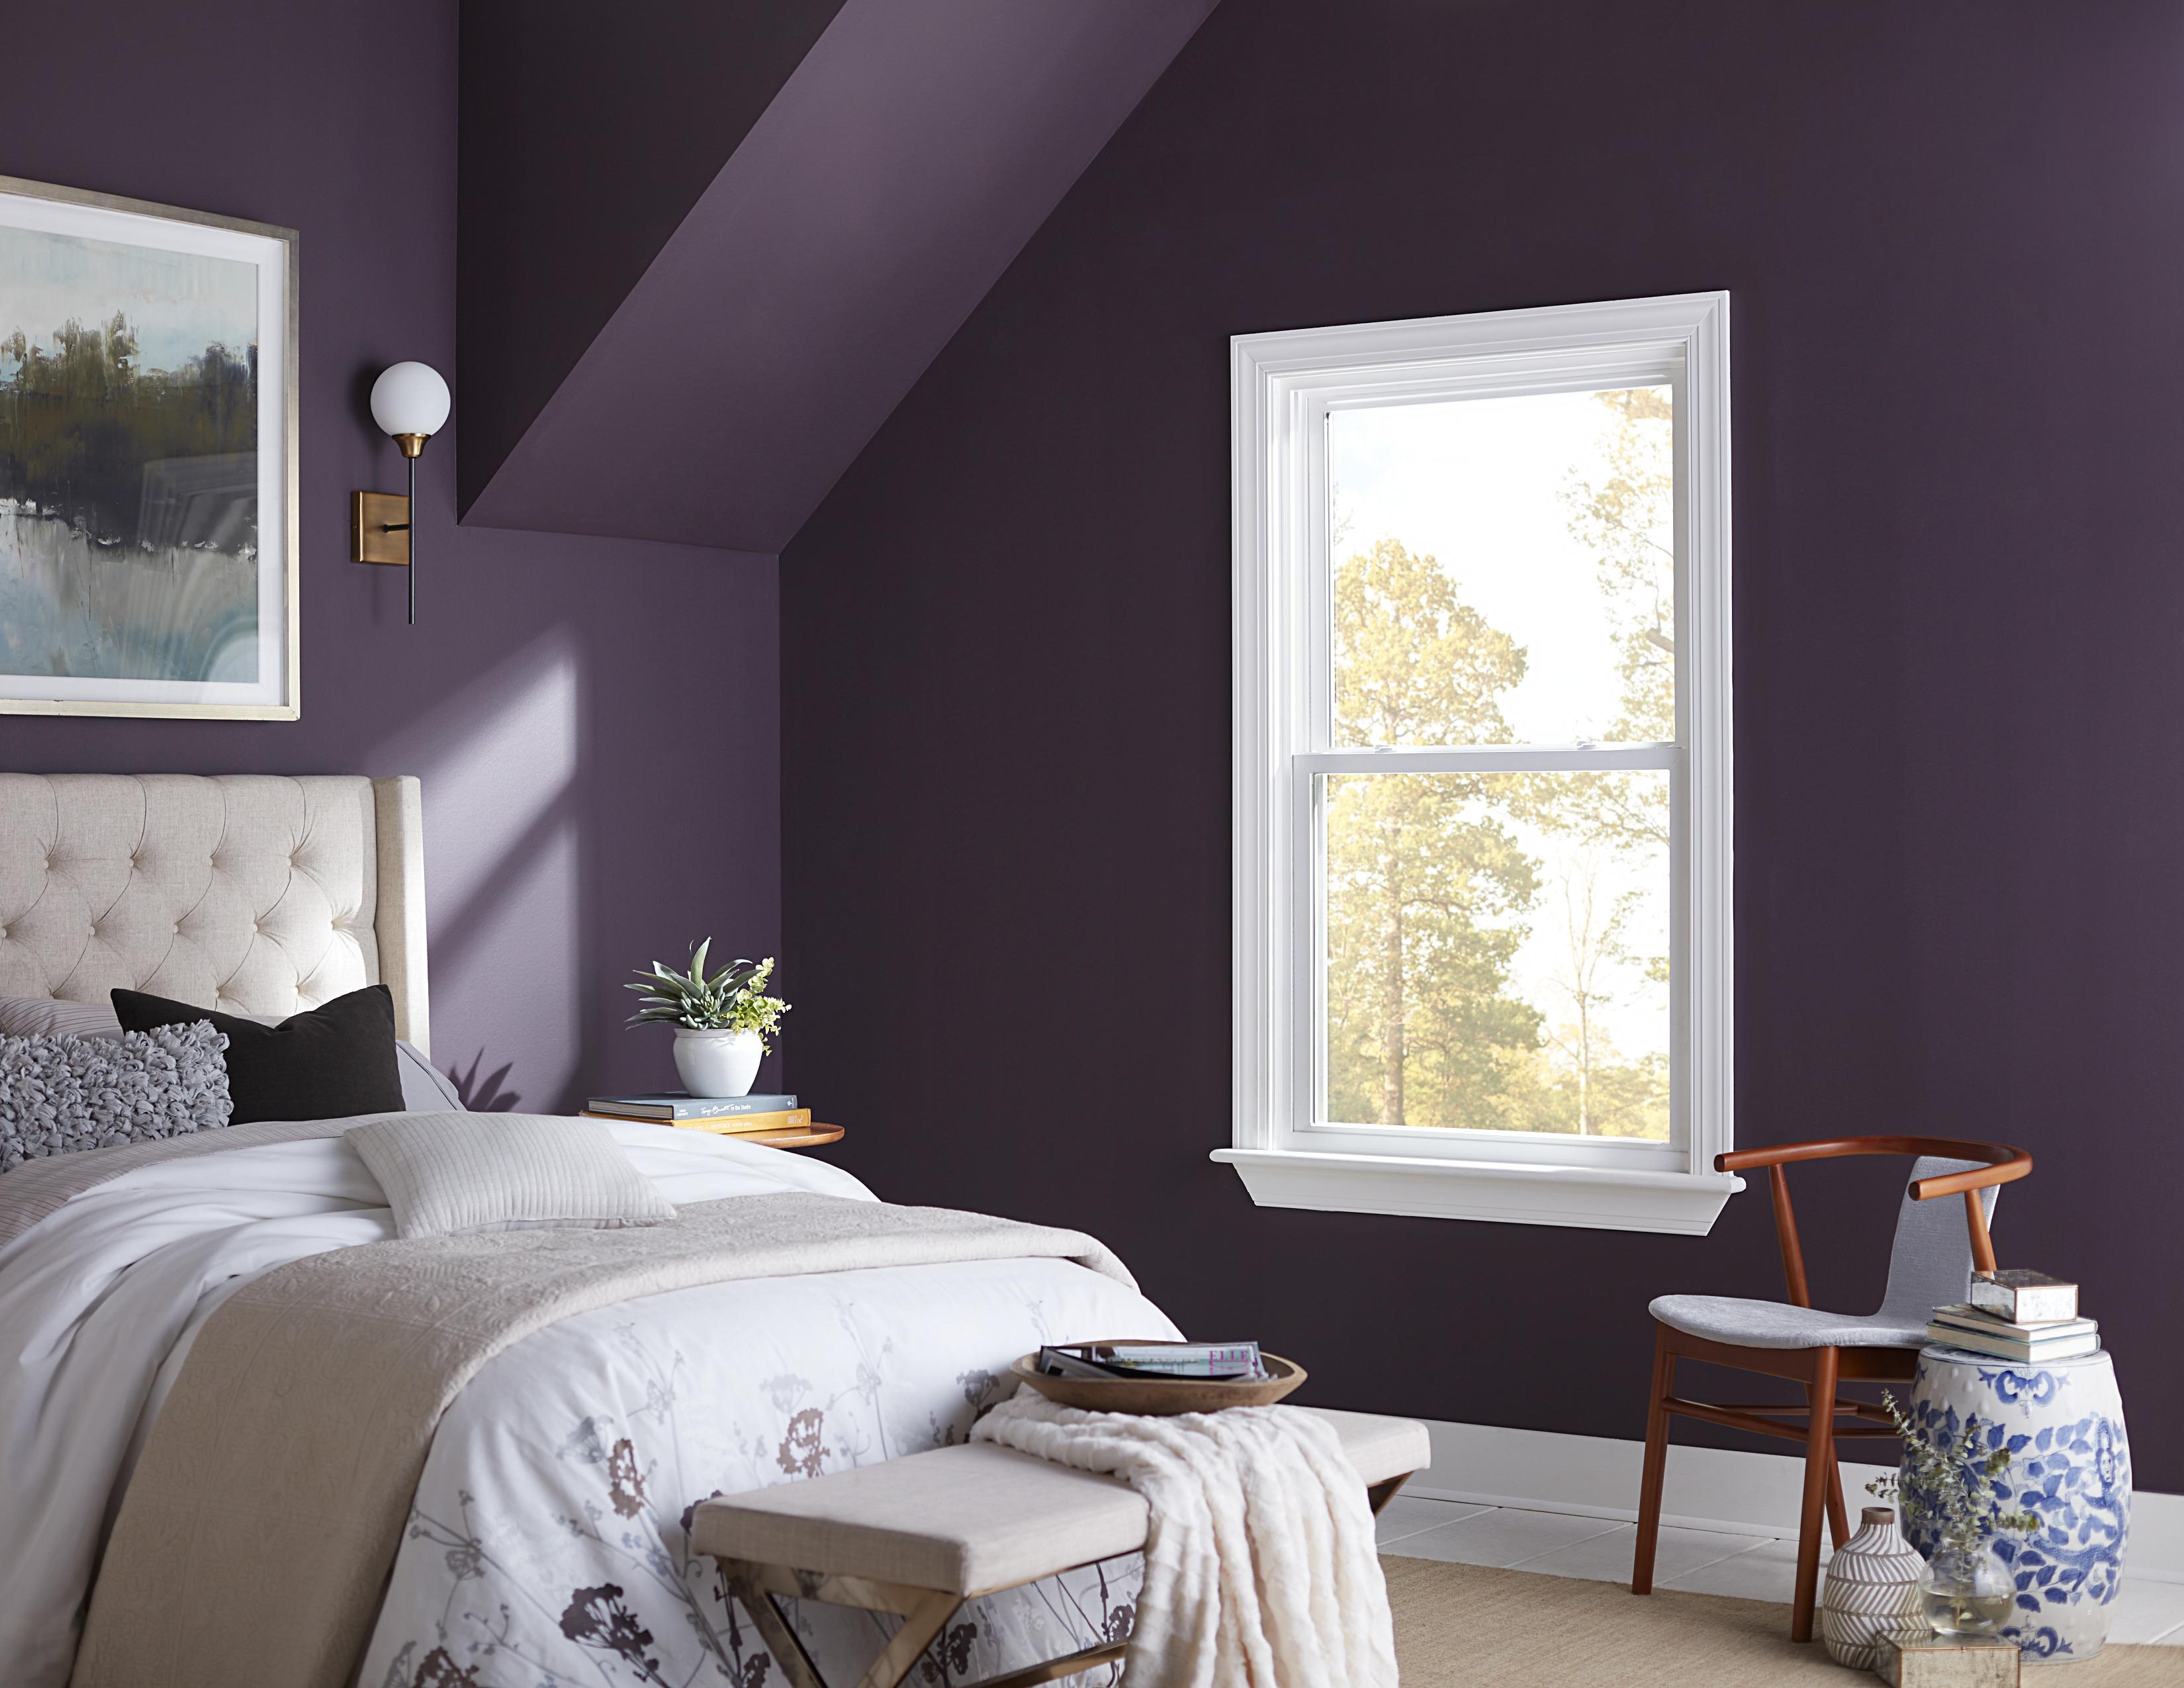 New JELD WEN Vinyl Windows and Patio Doors Blend Elegant Views   Value    Business WireNew JELD WEN Vinyl Windows and Patio Doors Blend Elegant Views  . New Style Patio Doors. Home Design Ideas